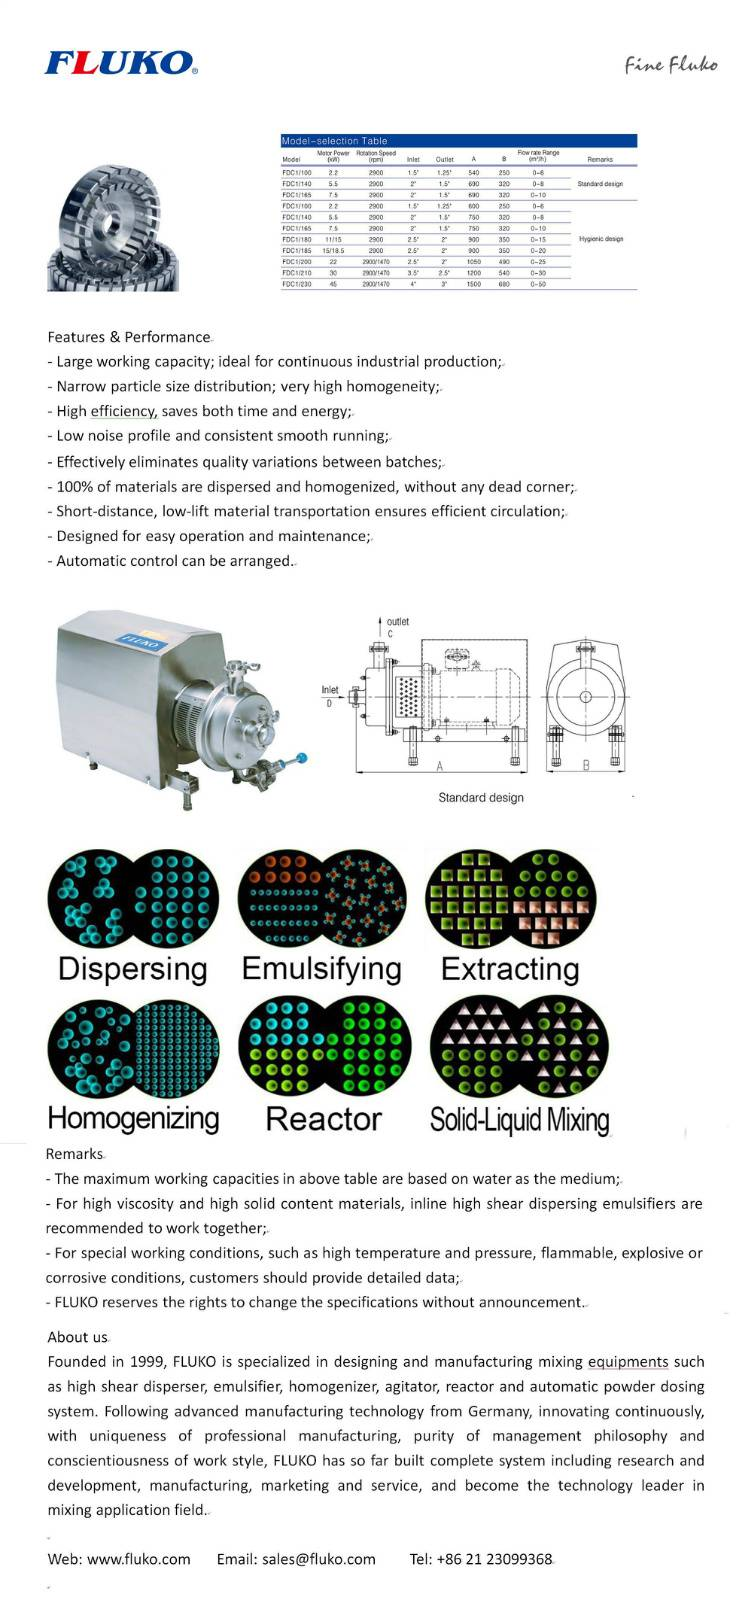 FLUKO Inline High Shear Dispersing Emulsifier